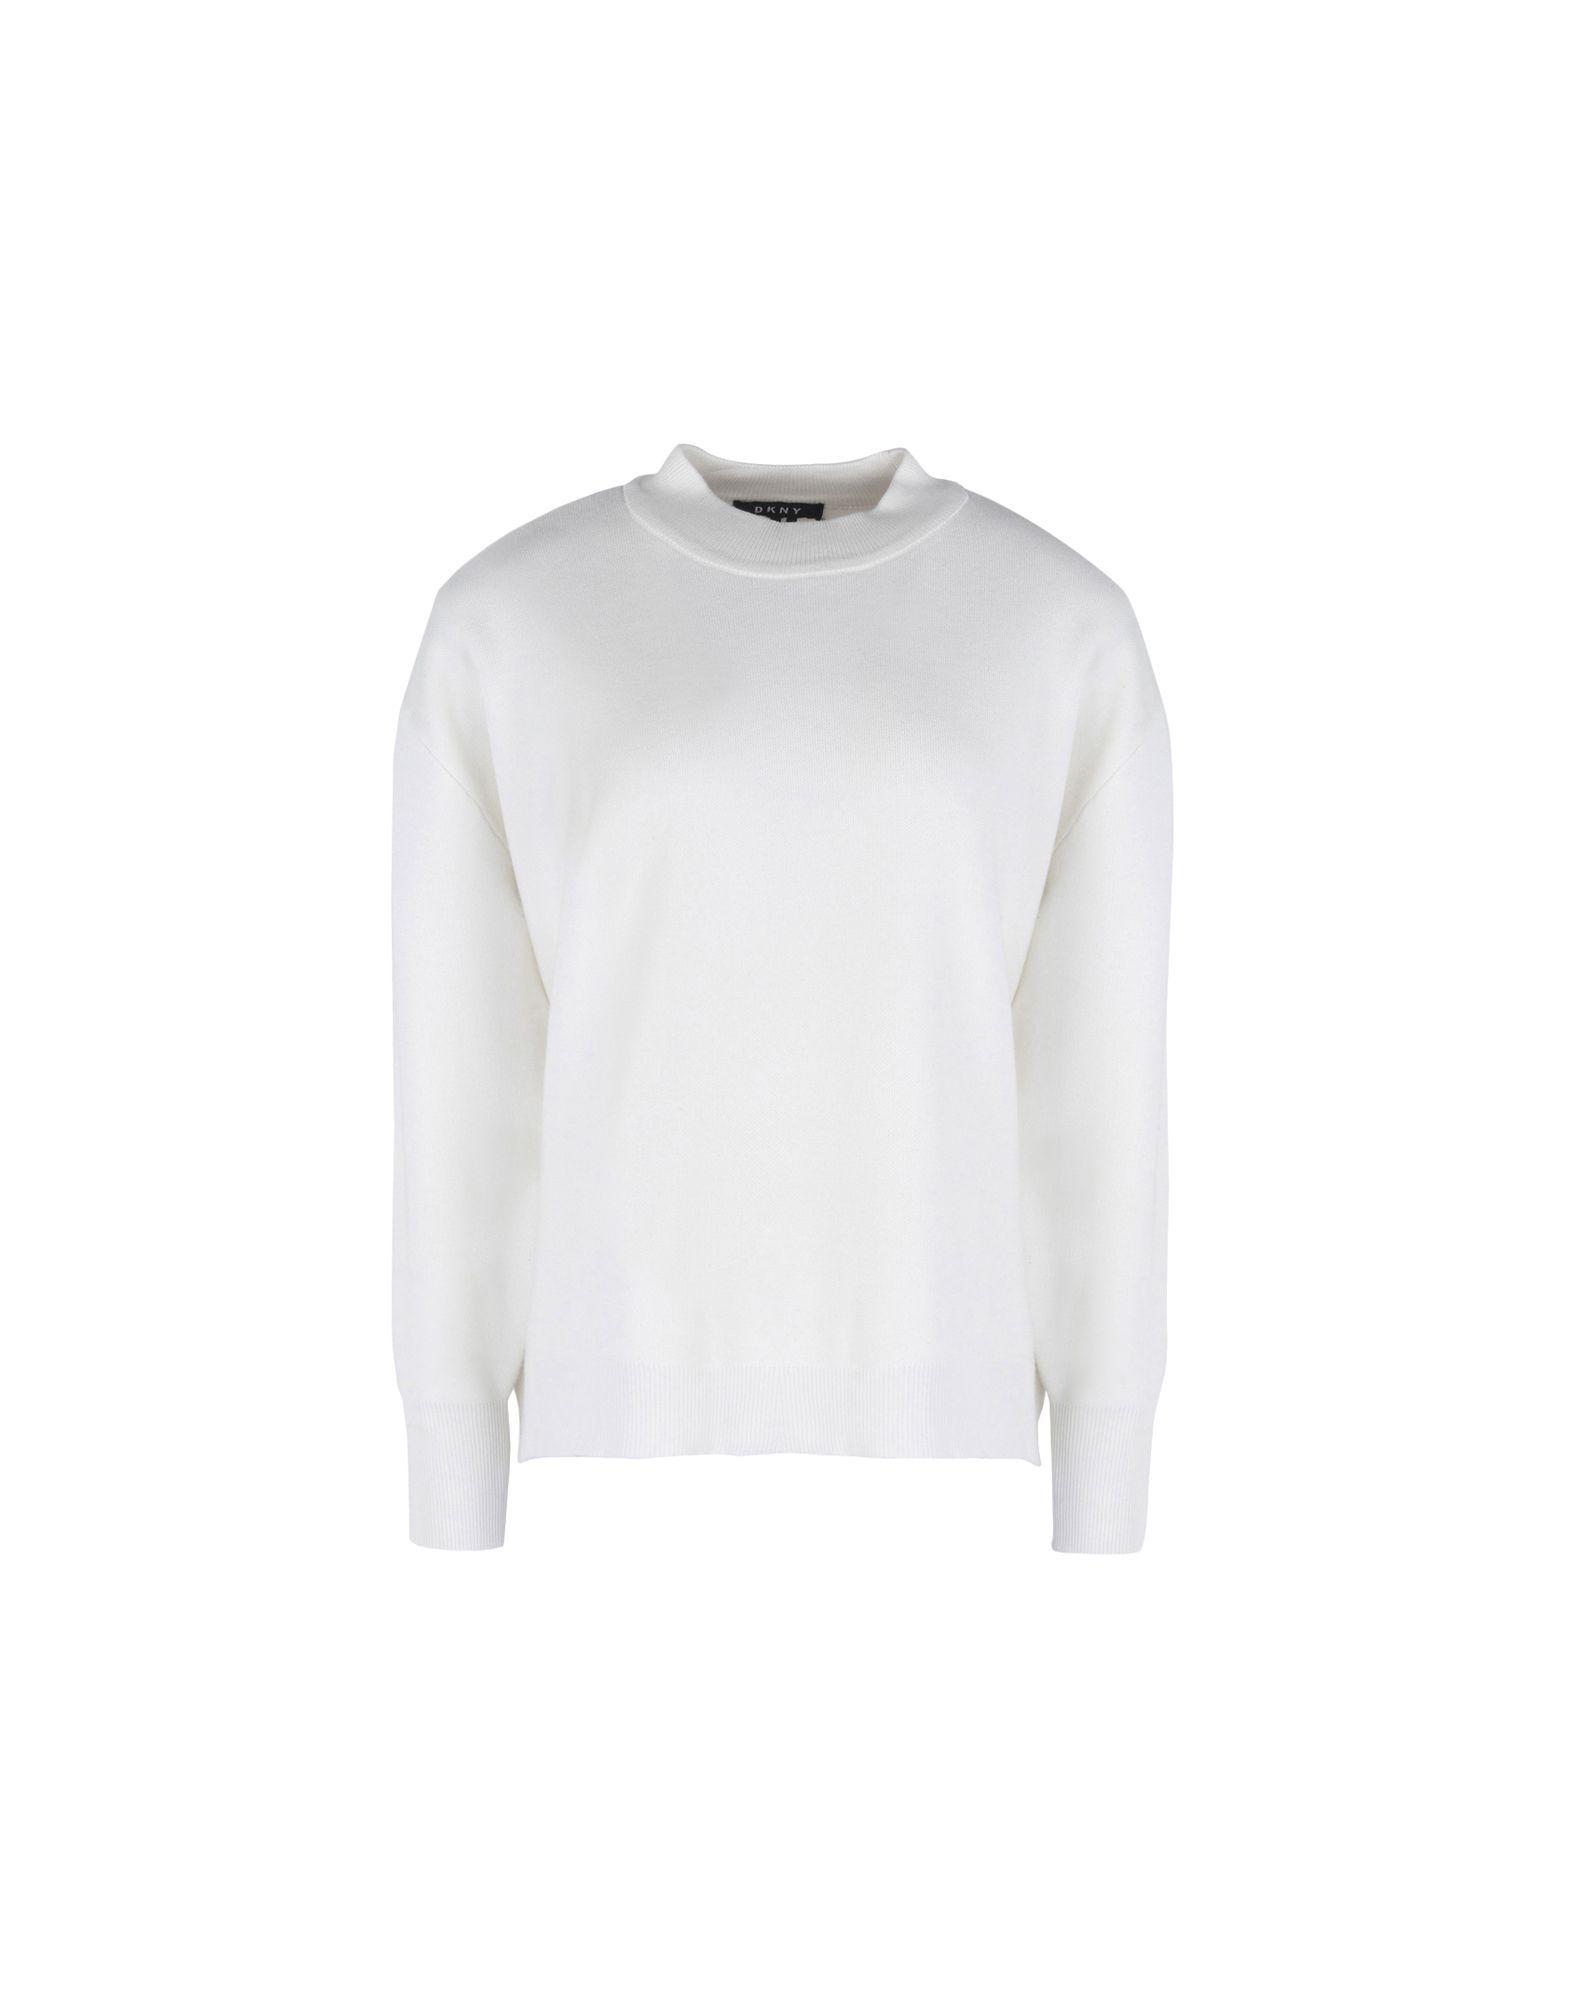 DKNY White Knit Jumper